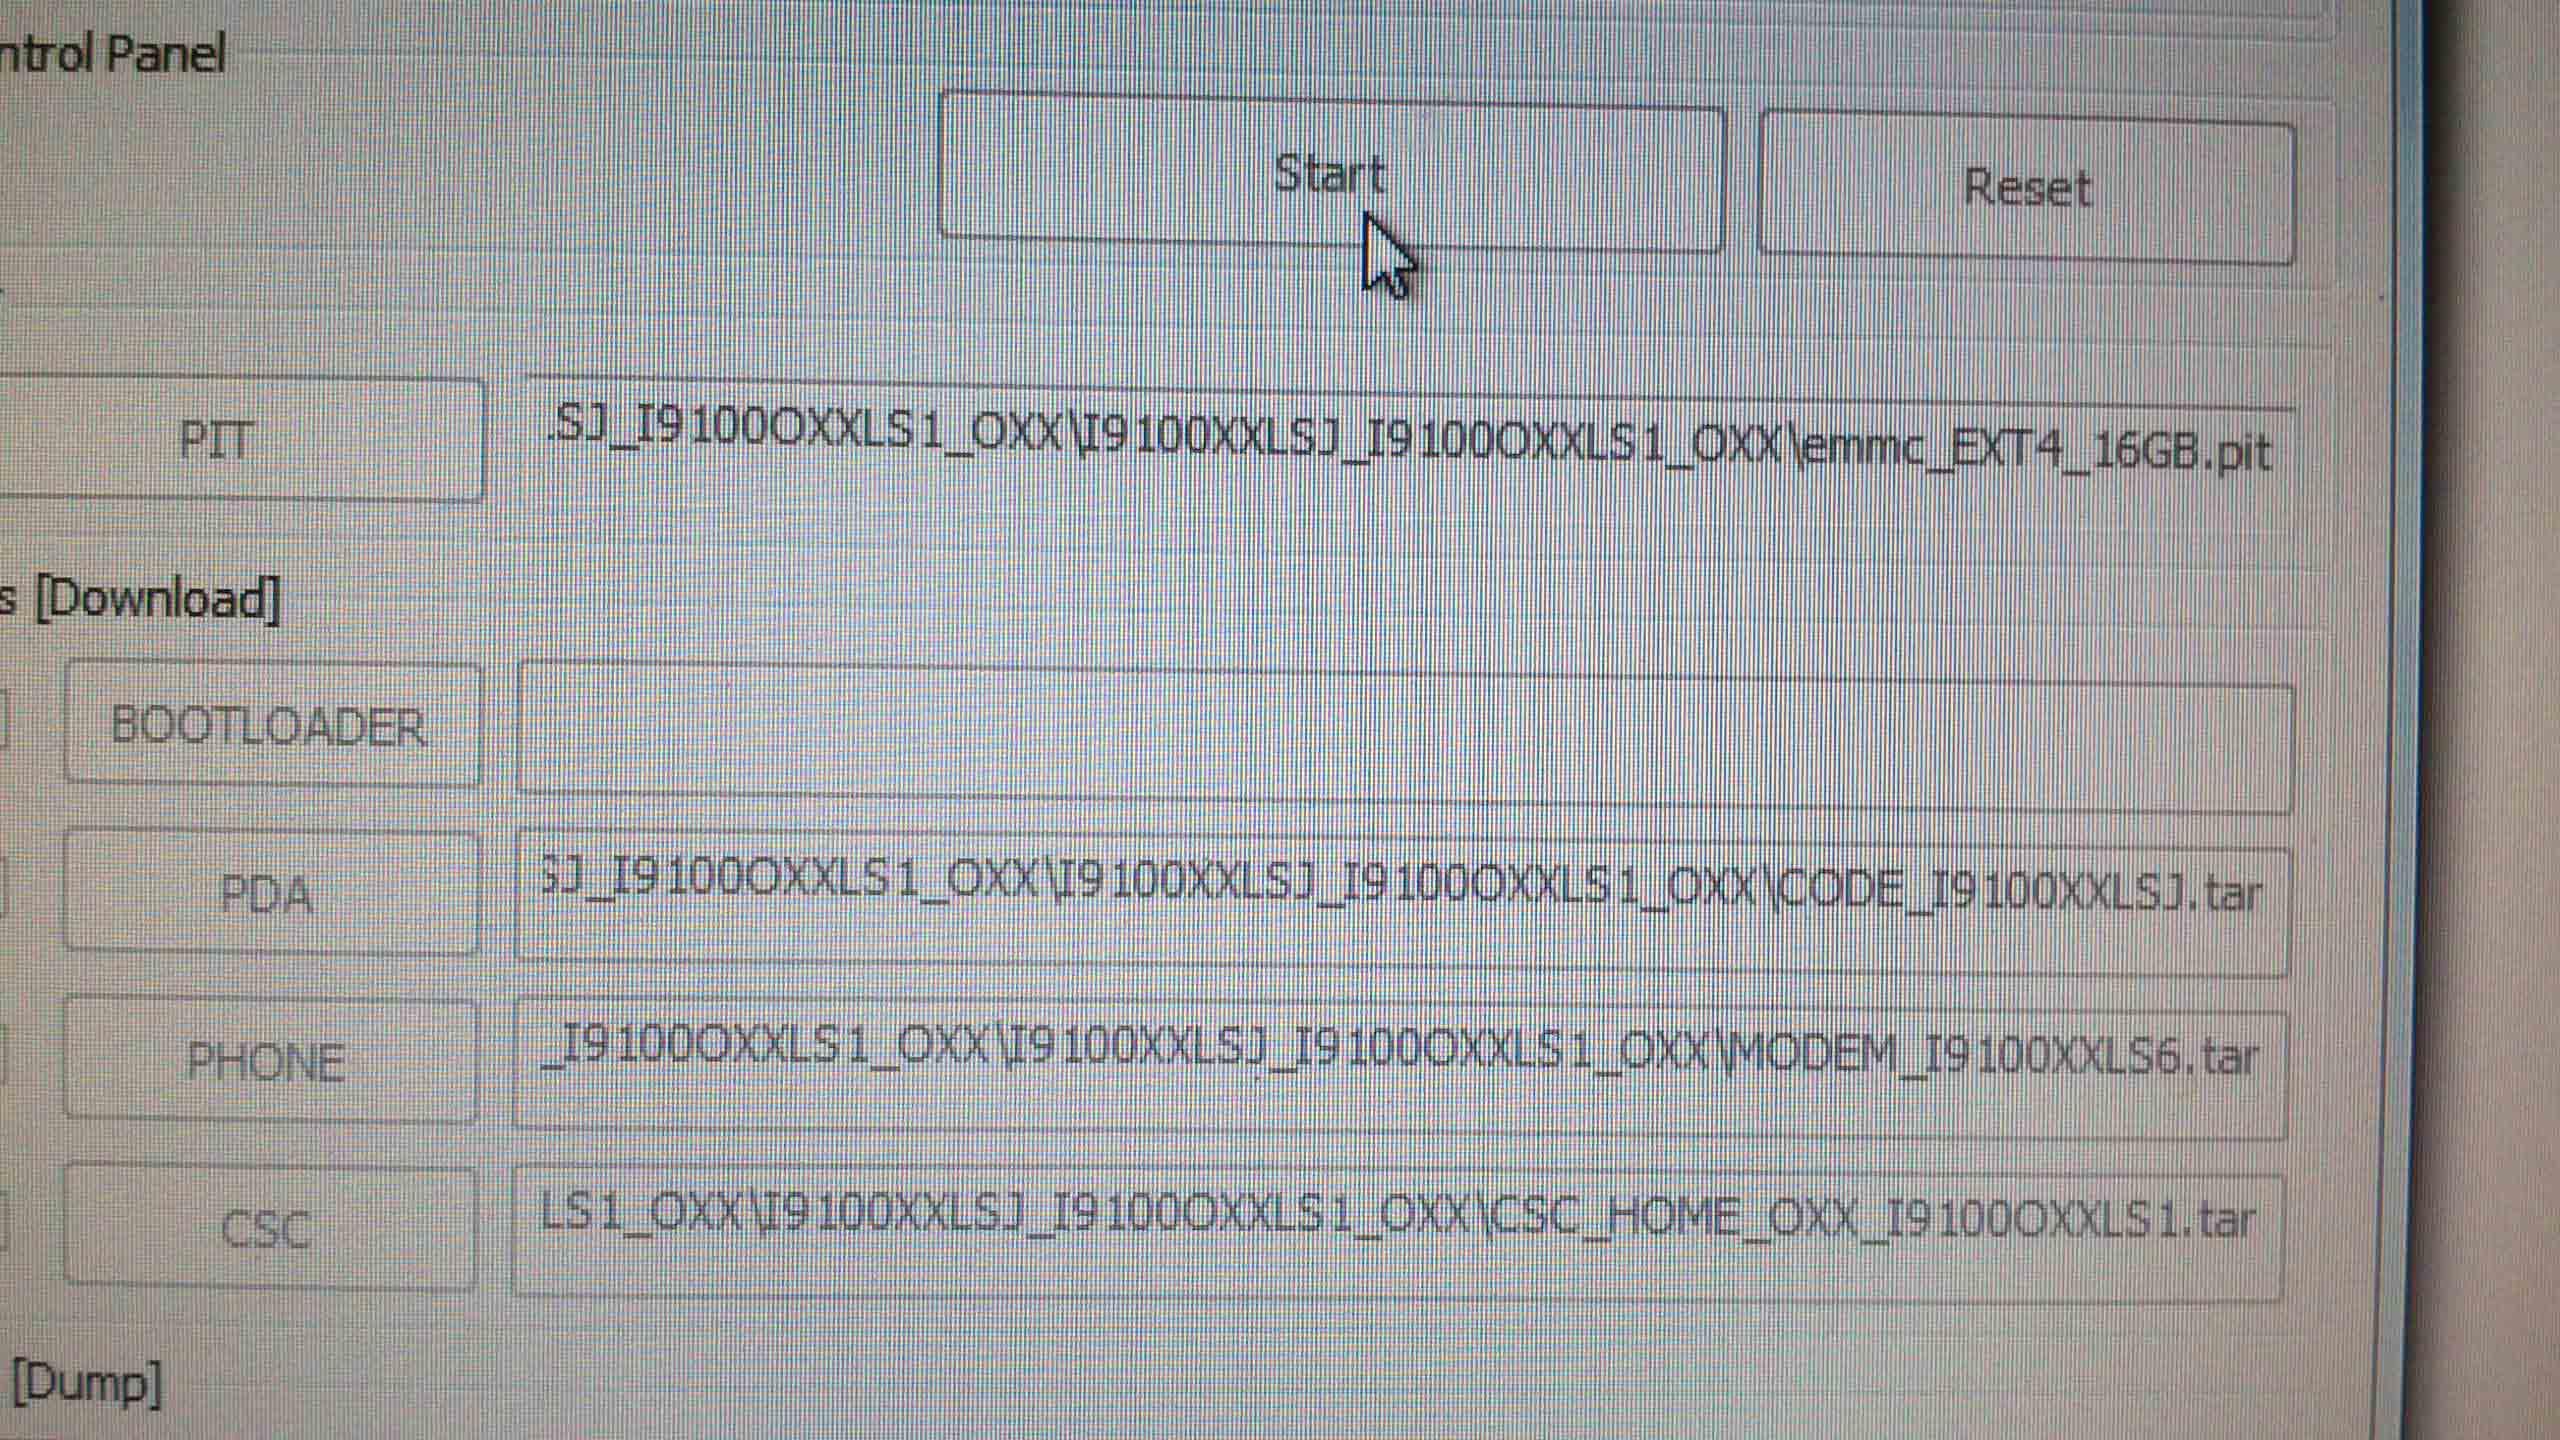 ... openw3.com/wp-content/uploads/2012/11/Jelly_Bean_Galaxys2_Odin1.jpg